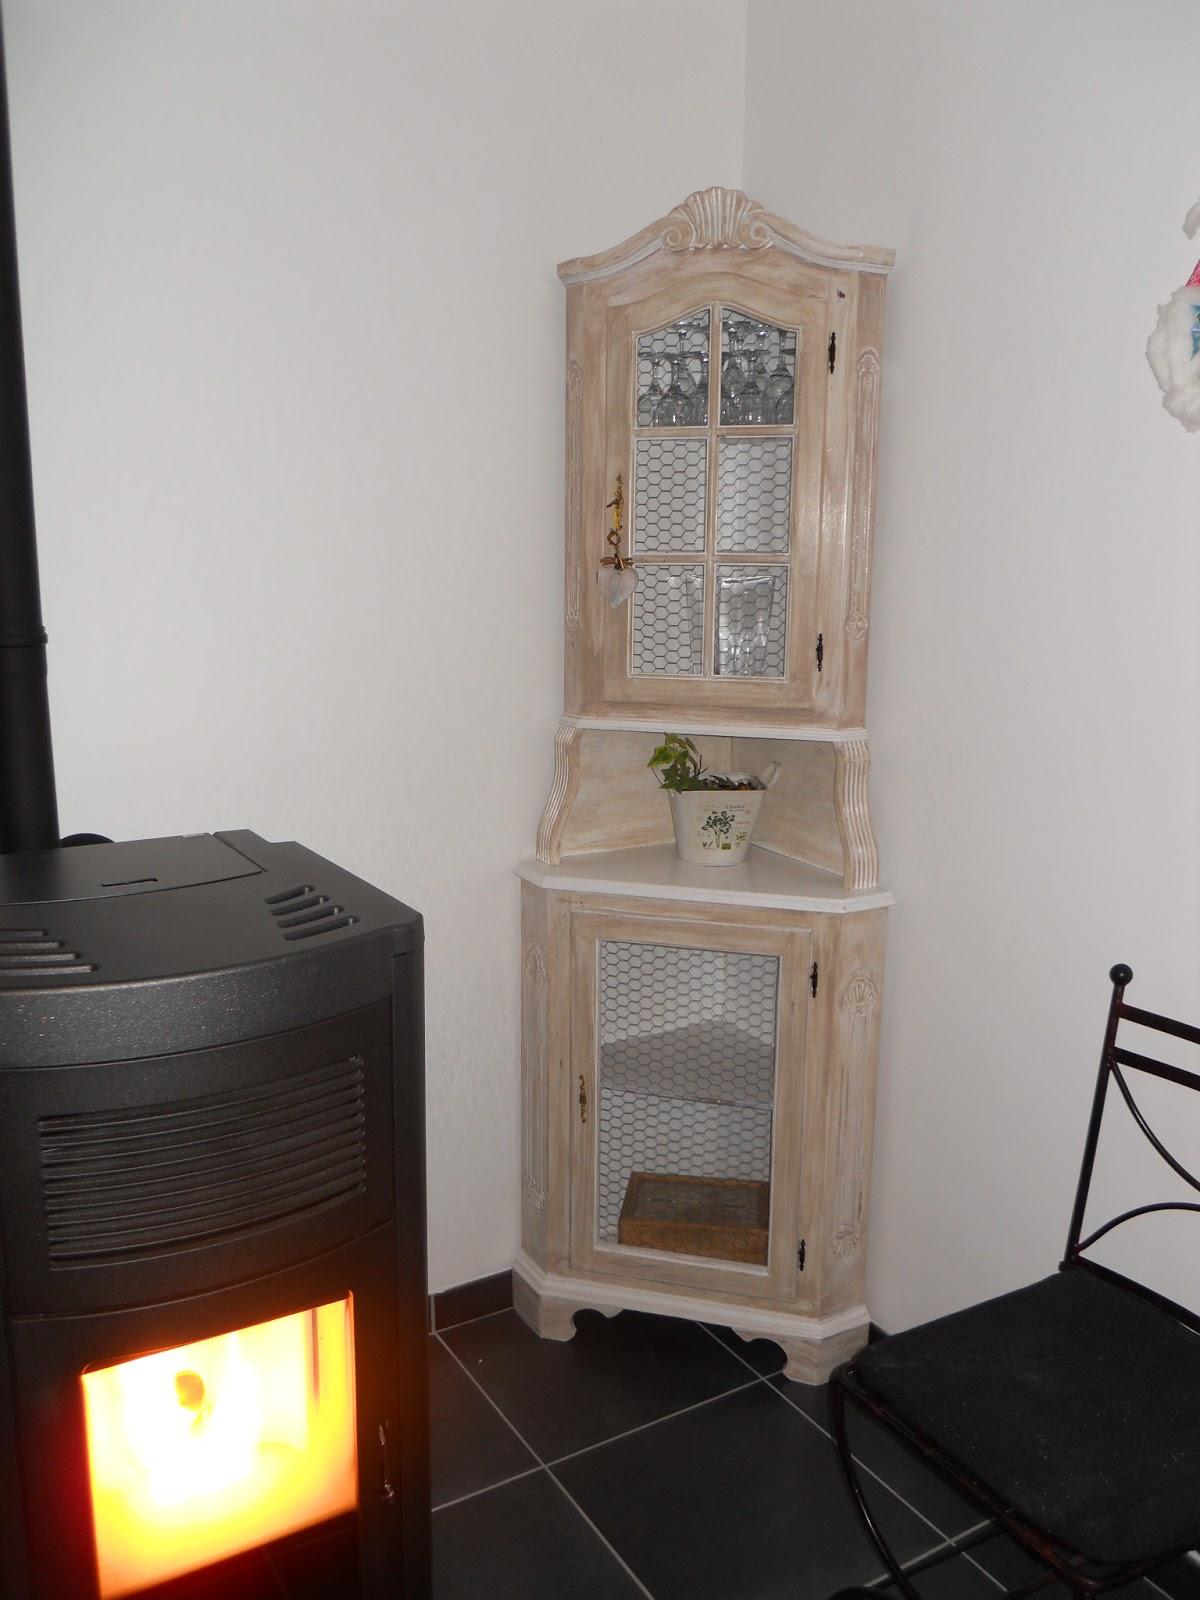 Meubles d co meuble d 39 angle enti rement relook au style charme - Meuble angle chambre ...